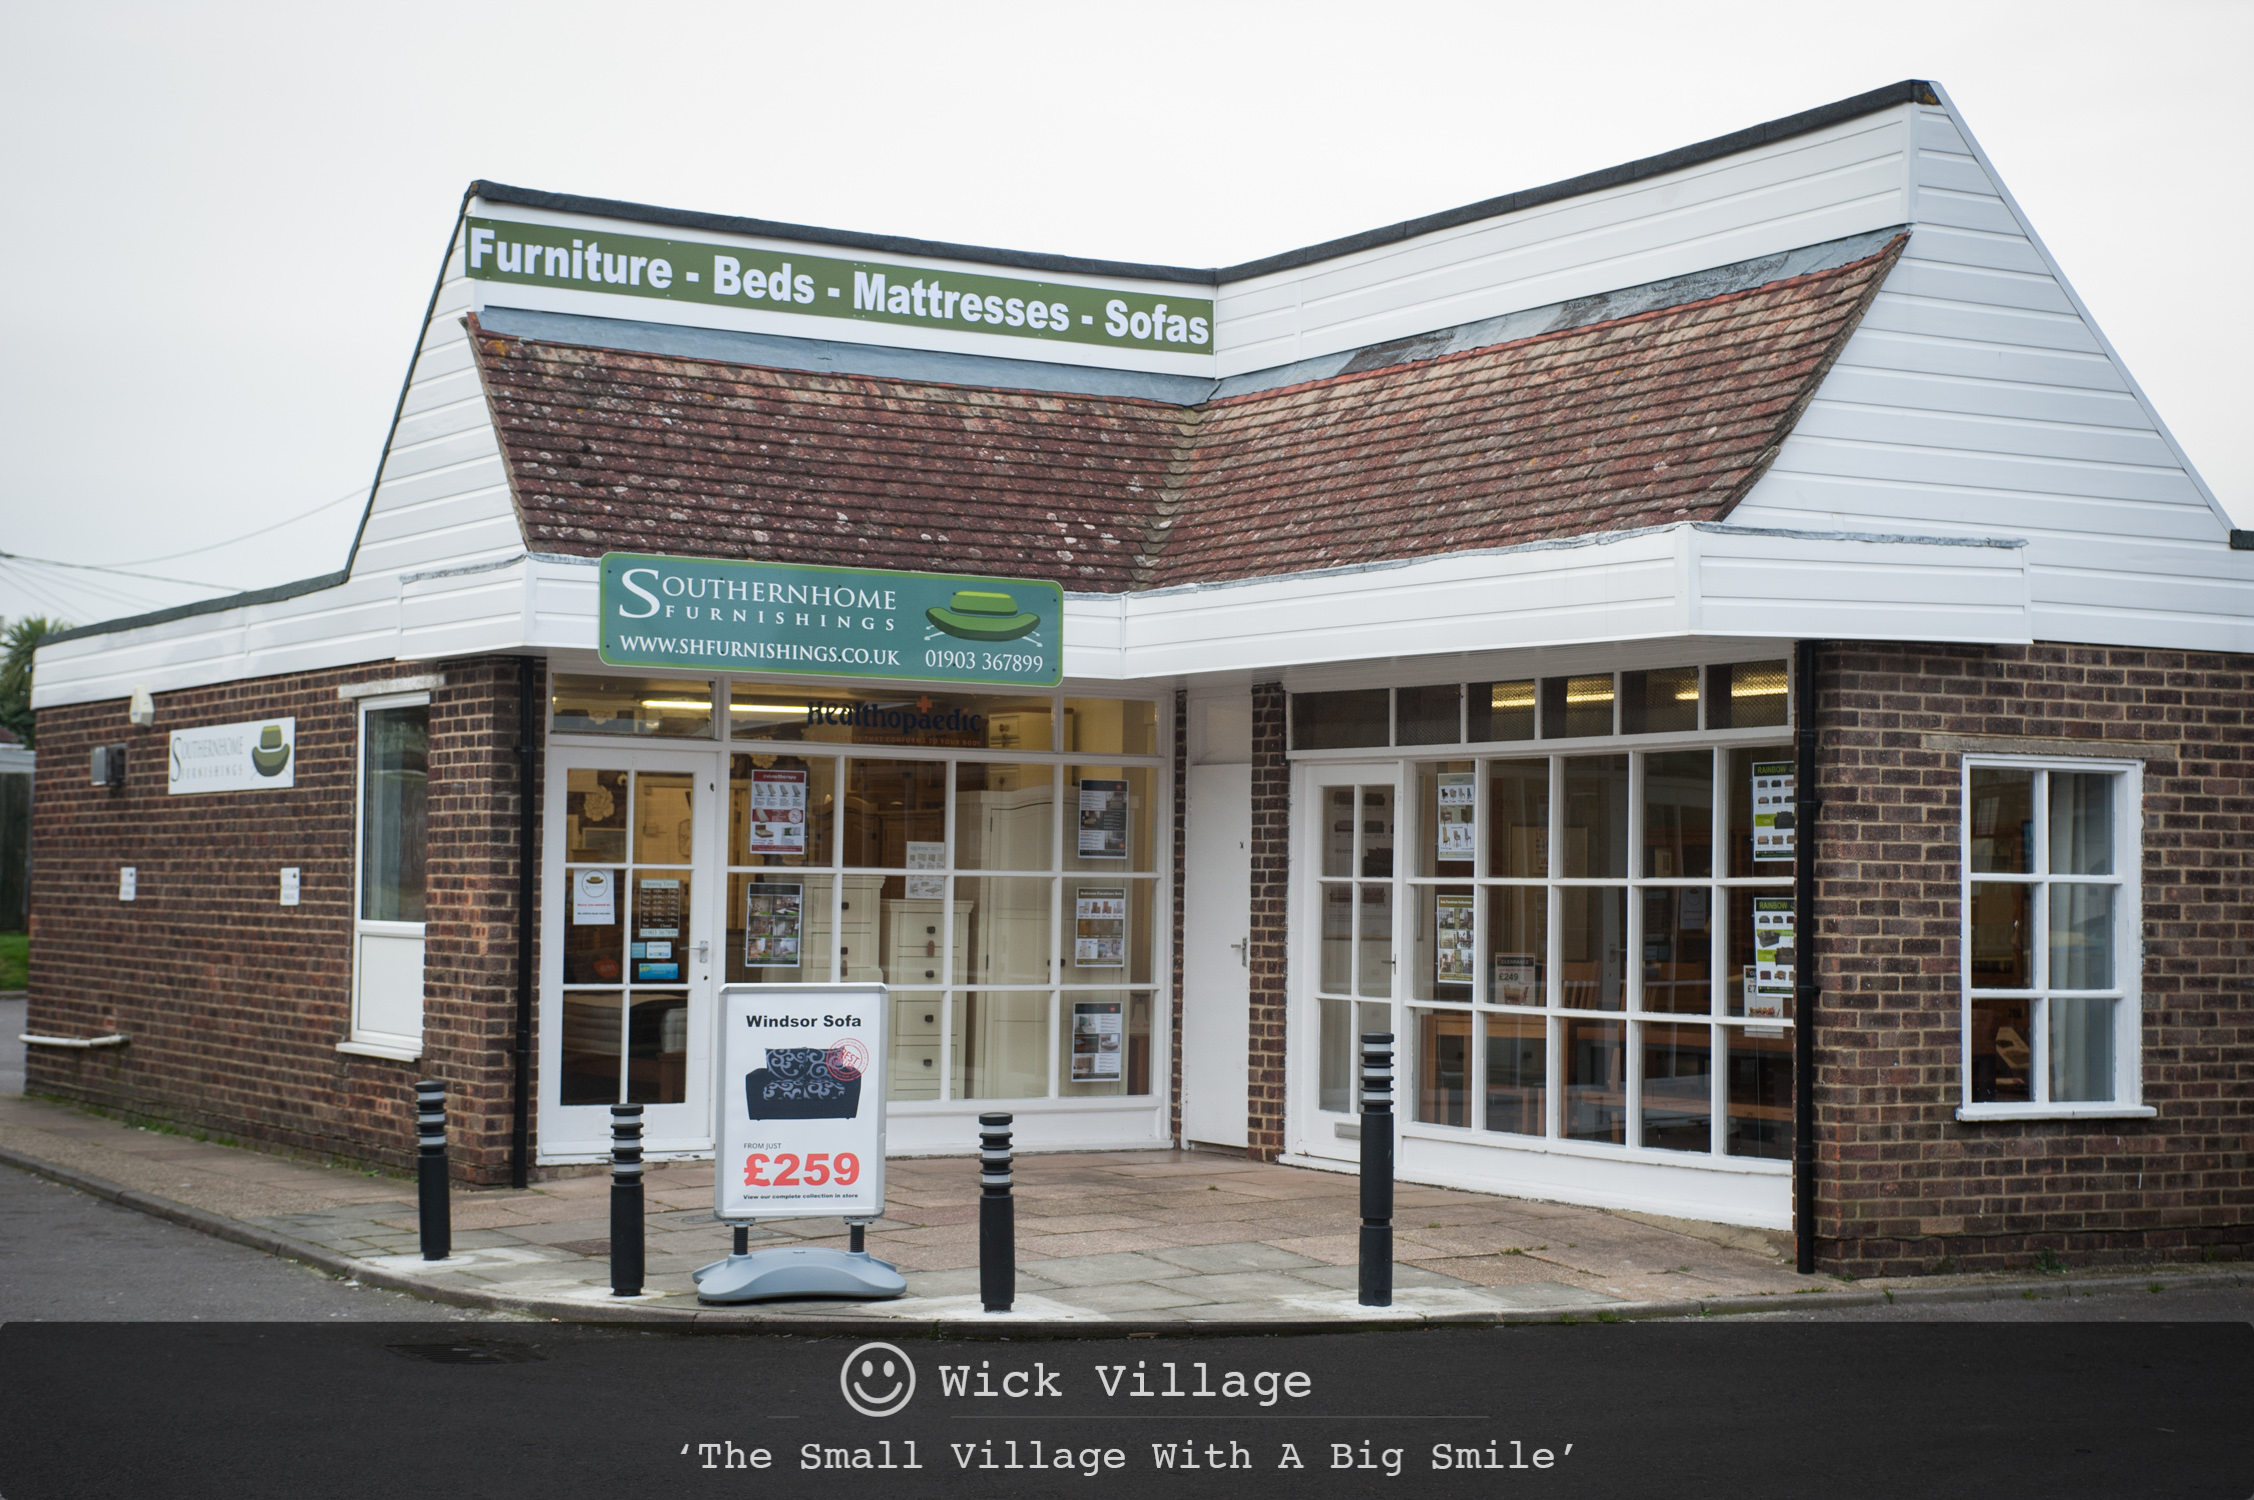 Southern Home Furnishings, Wick Village, Littlehampton.